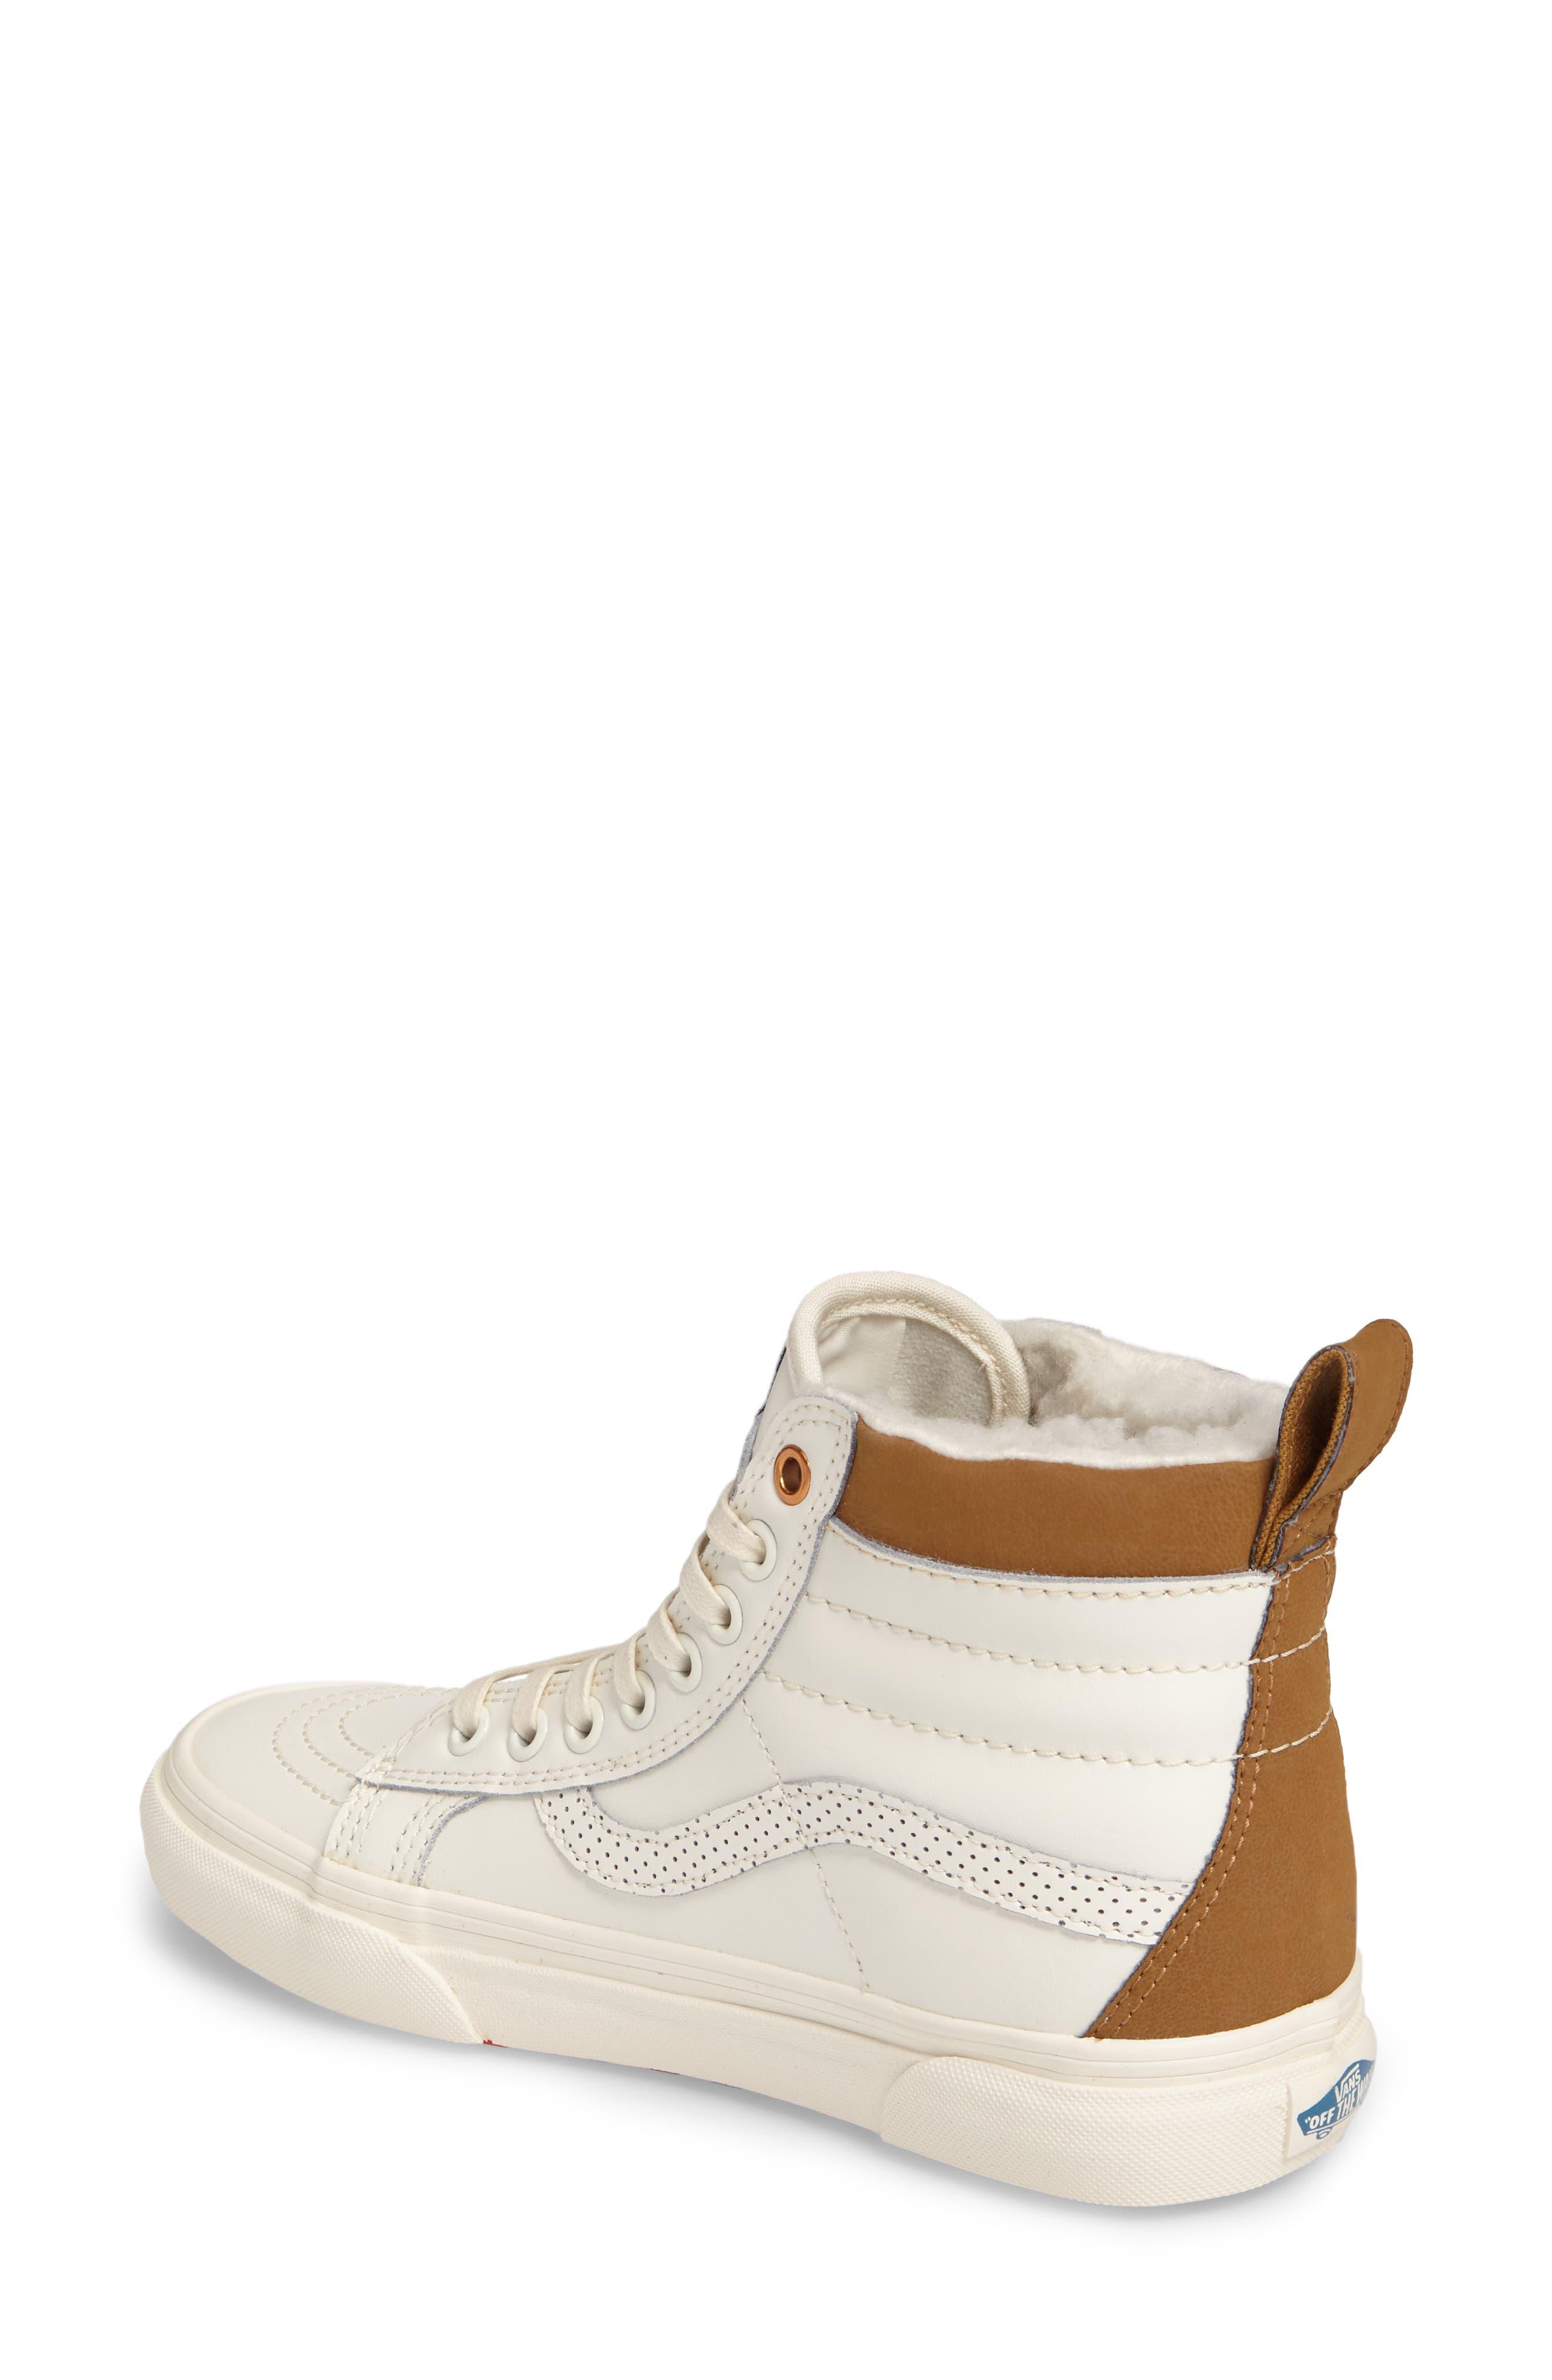 Alternate Image 2  - Vans Sk-8 Hi MTE Sneaker (Women)